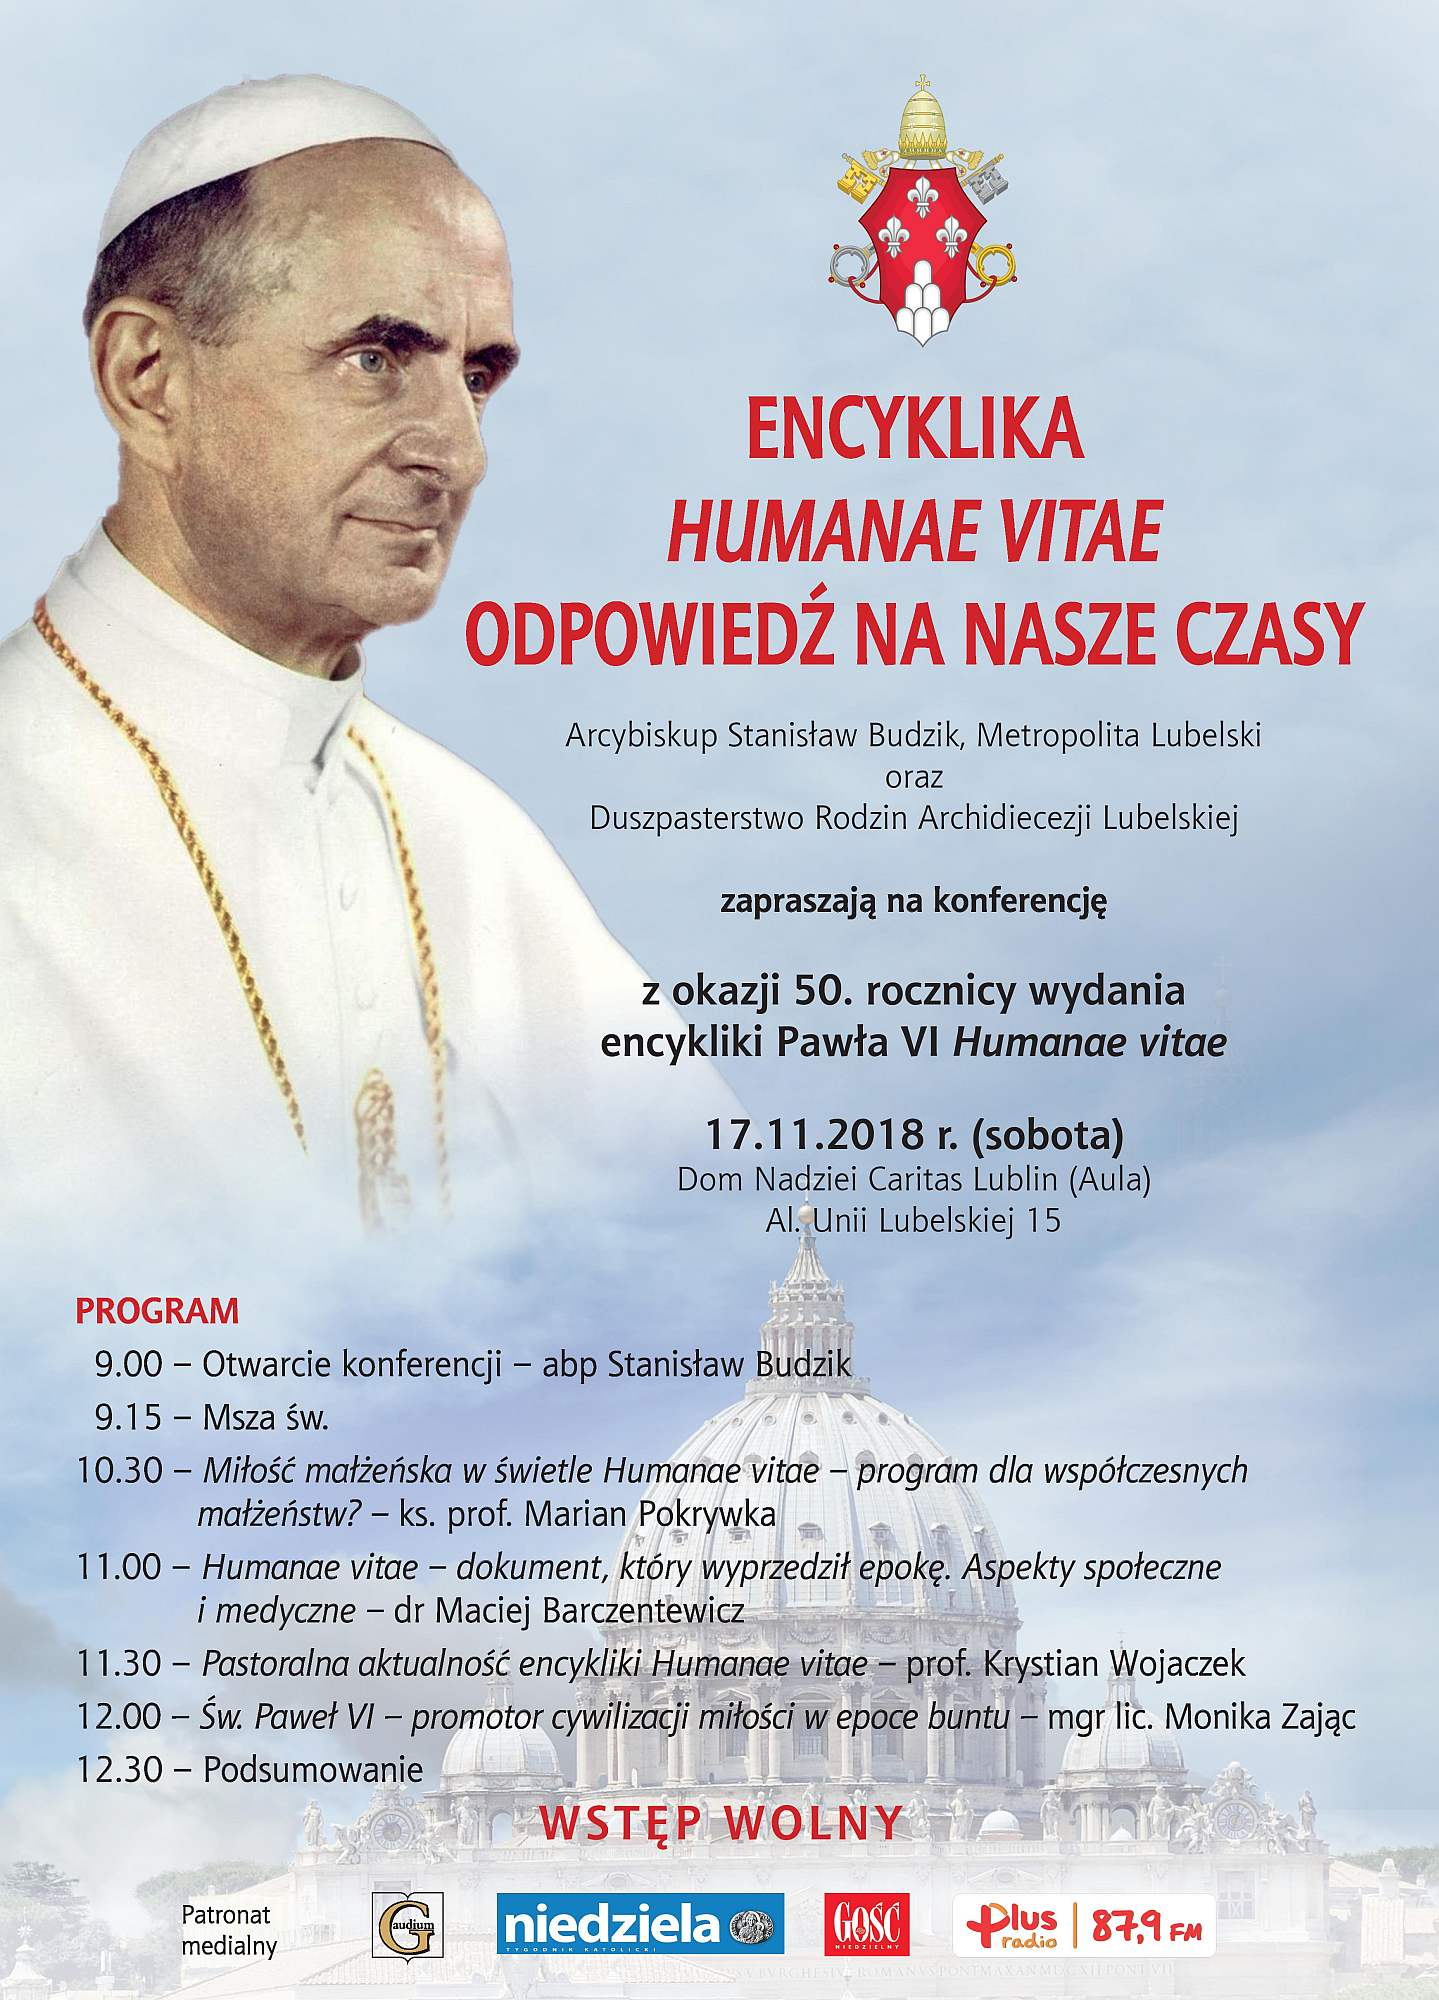 https://archidiecezjalubelska.pl/wp-content/uploads/2018/11/Pawel-VI-konf.jpg